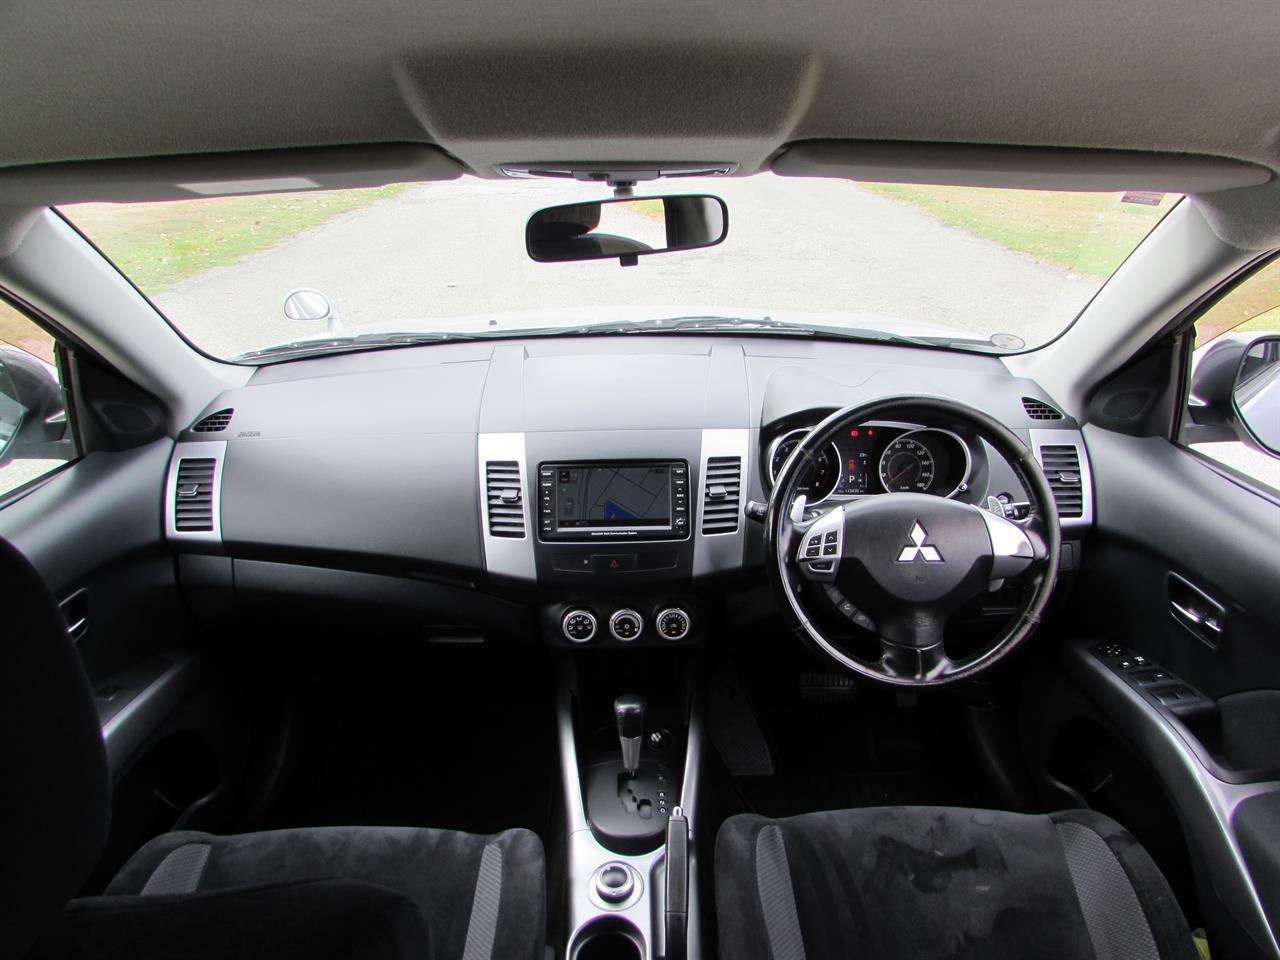 2009 Mitsubishi OUTLANDER   only $59 weekly